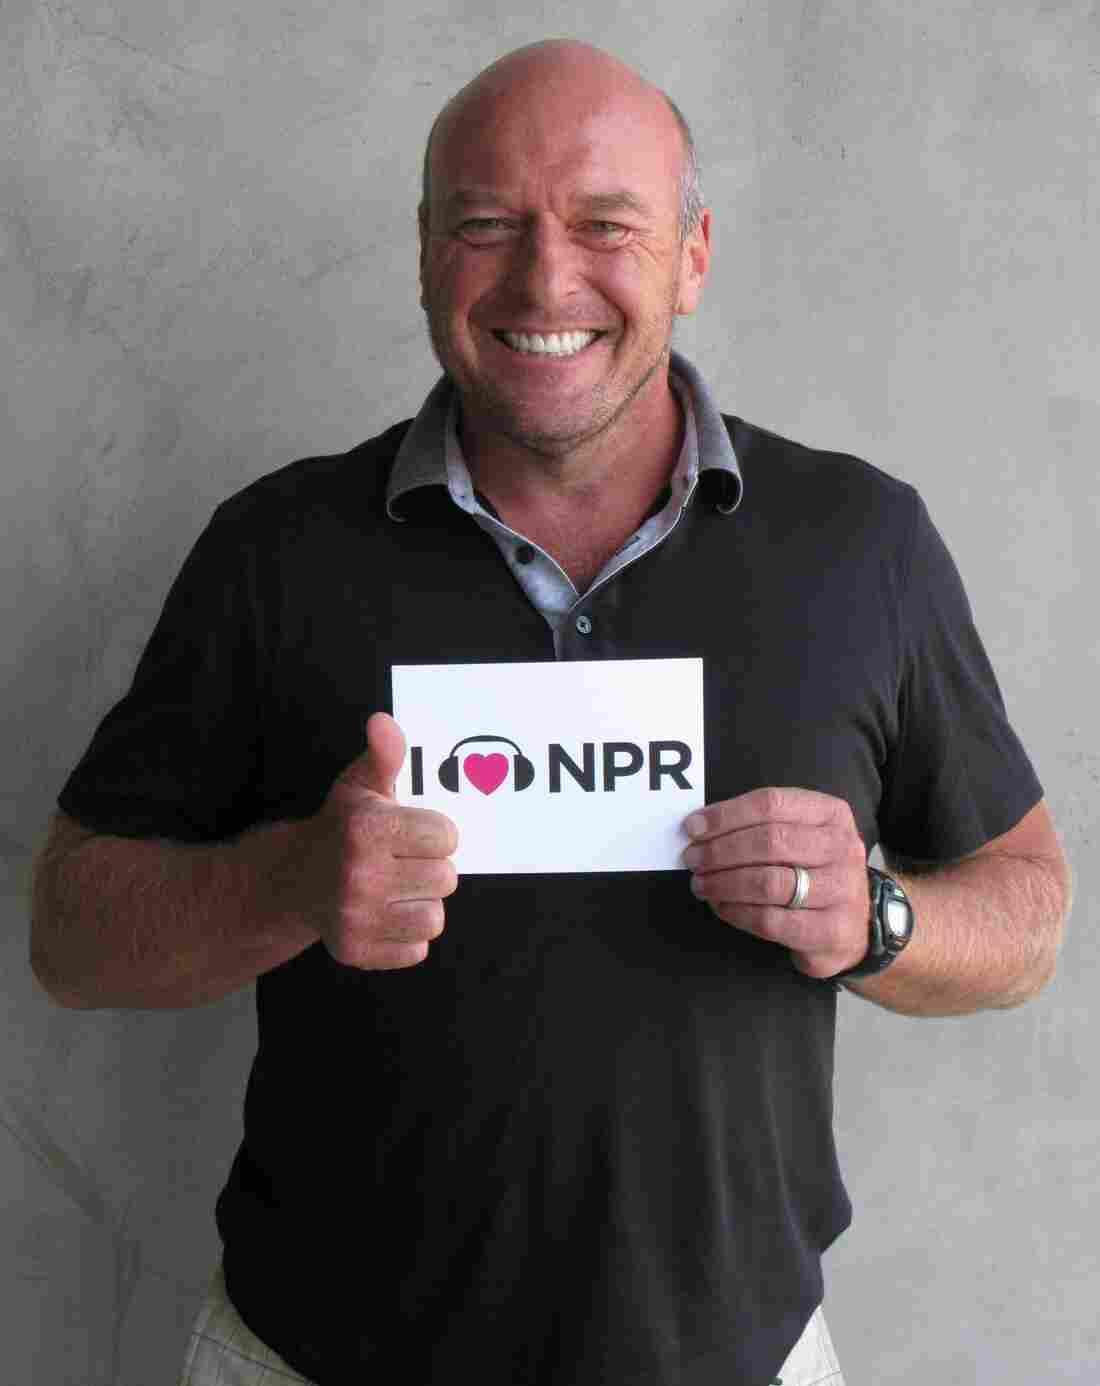 Dean Norris at NPR West.